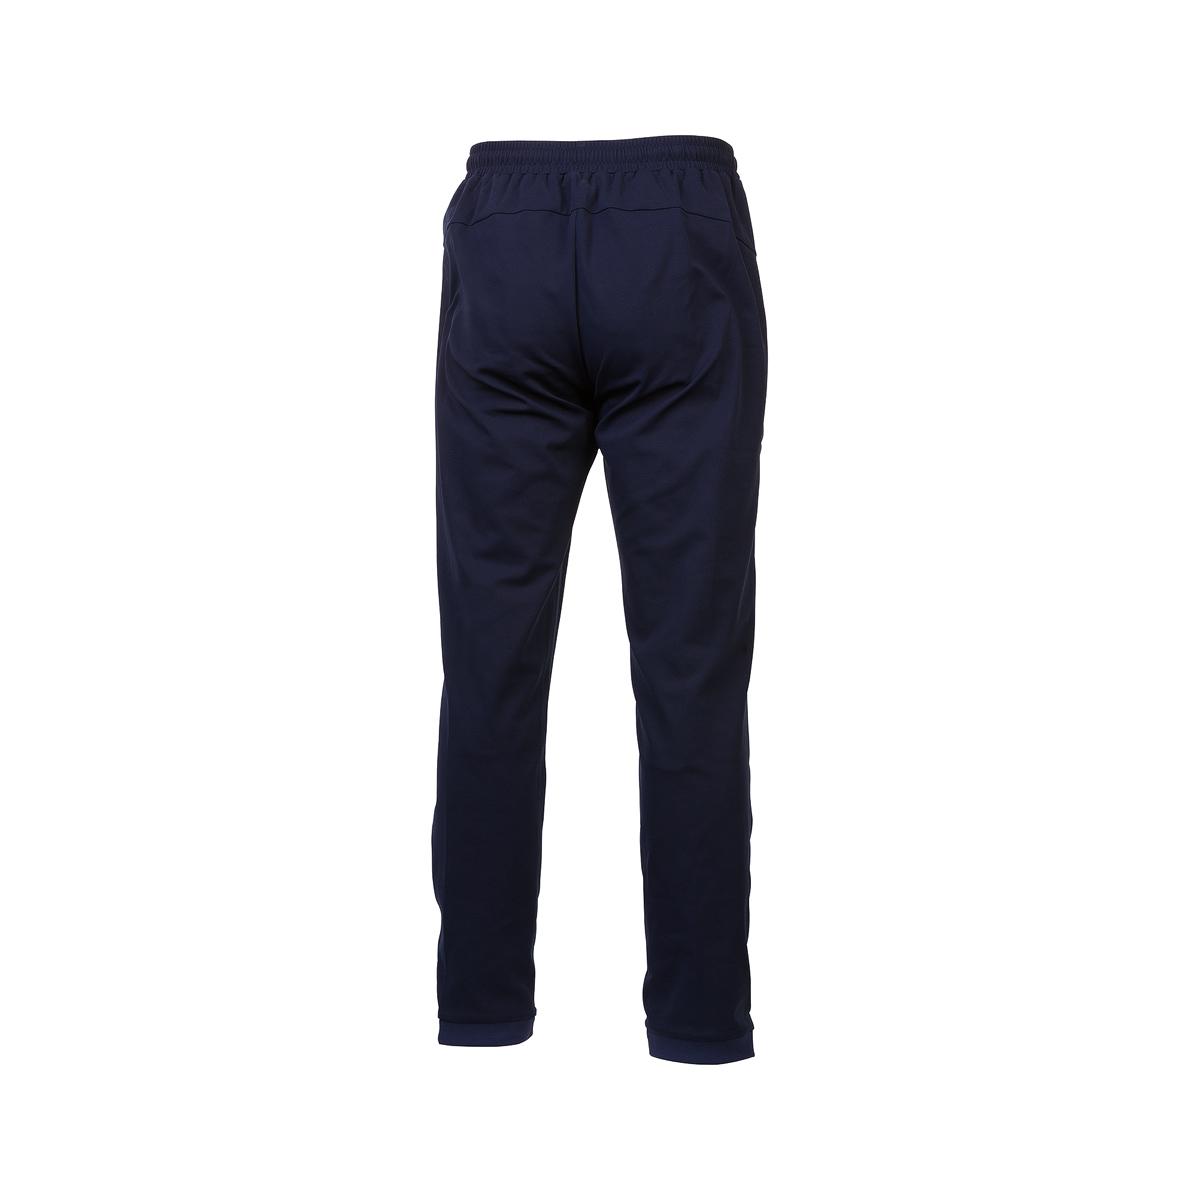 YONEX - Men's Warm-up Pants #60111Detailbild - 1